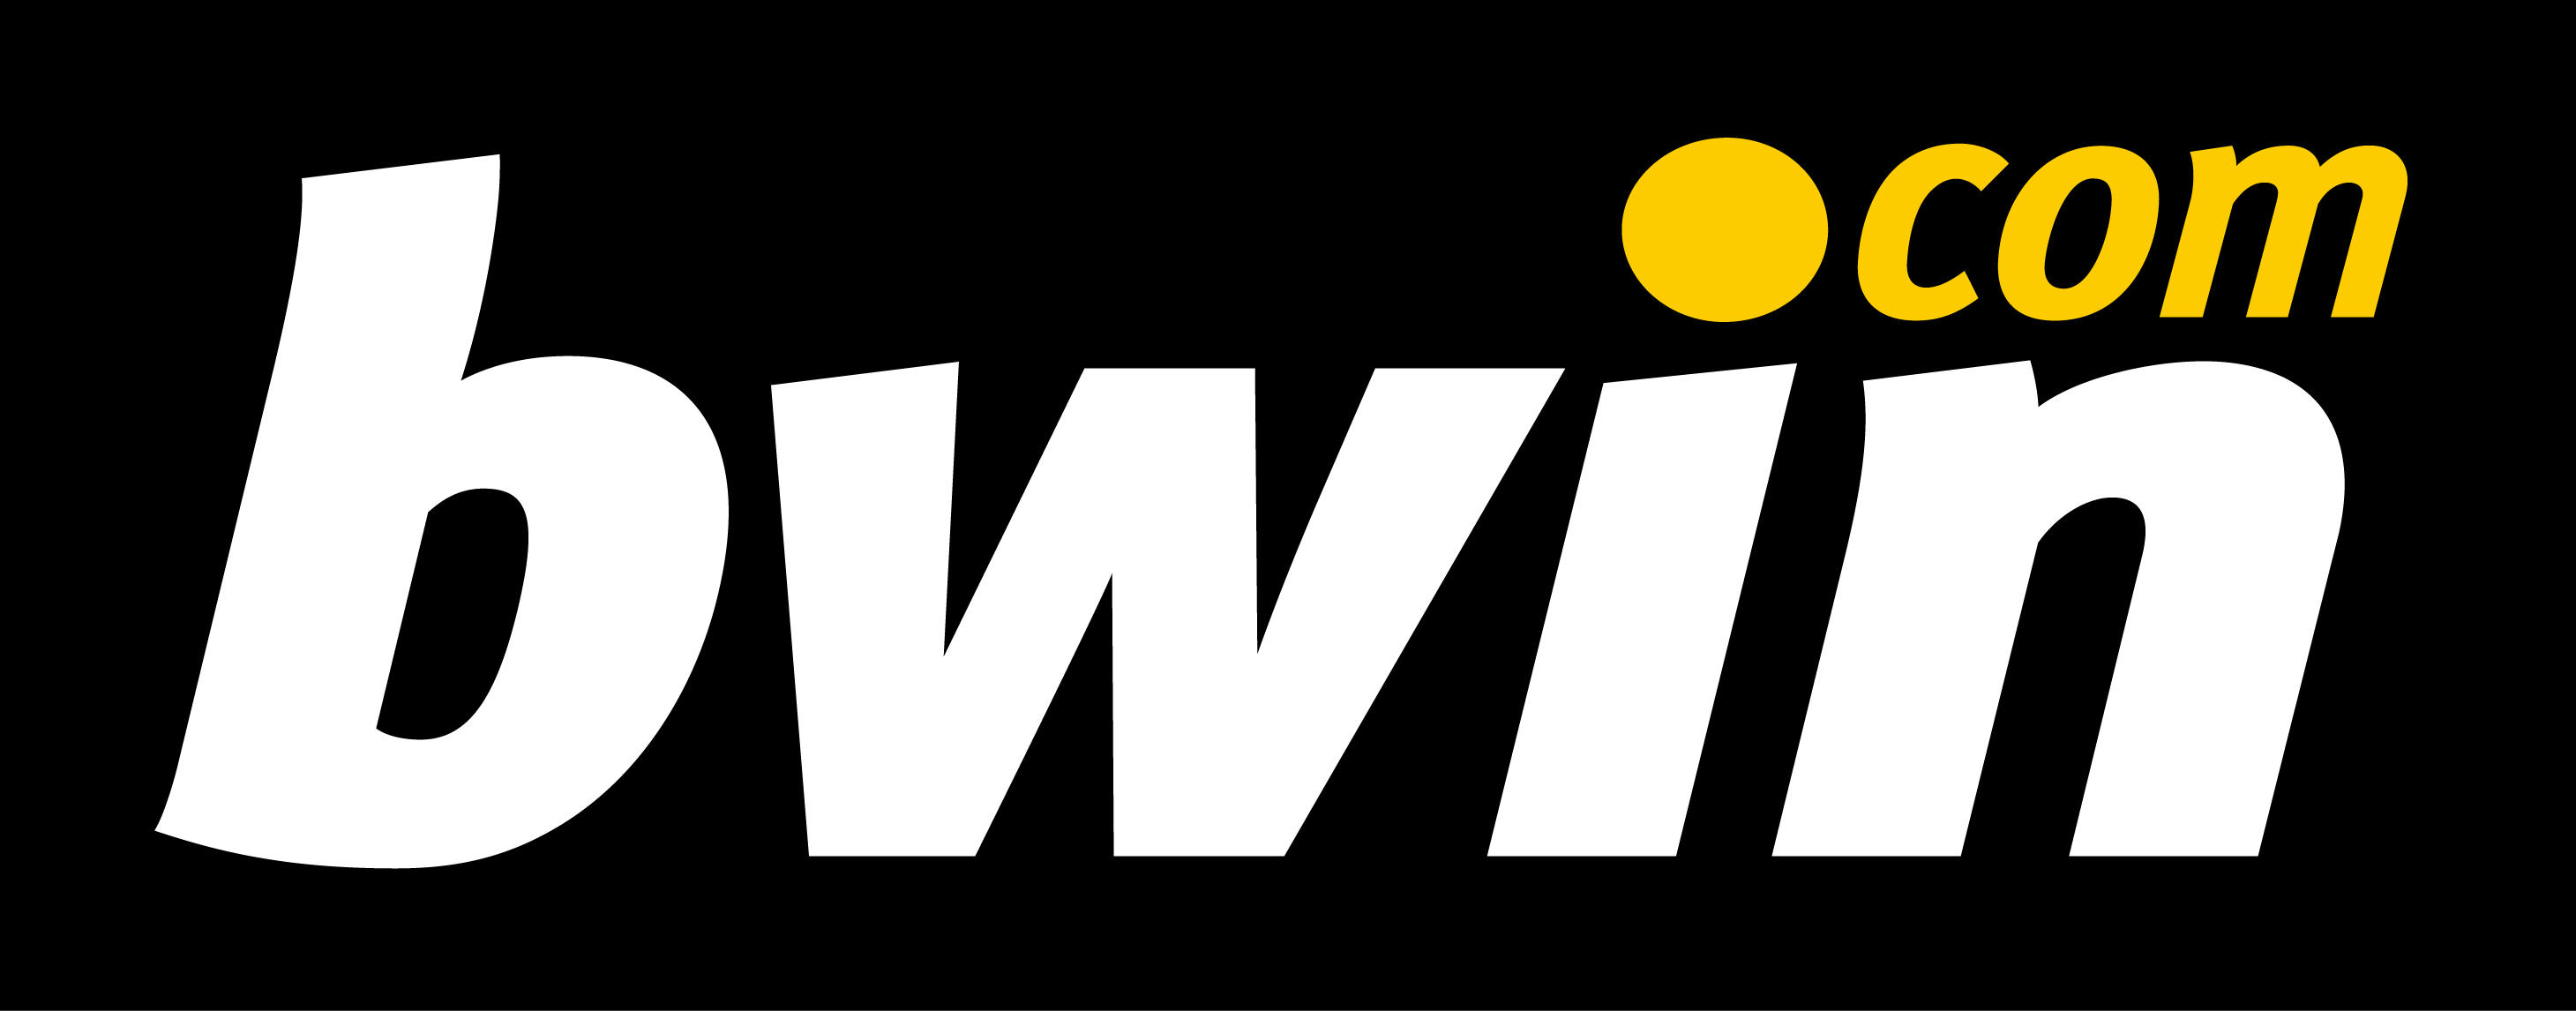 Alle 5 Bwin kortingscodes geldig in juli 2019